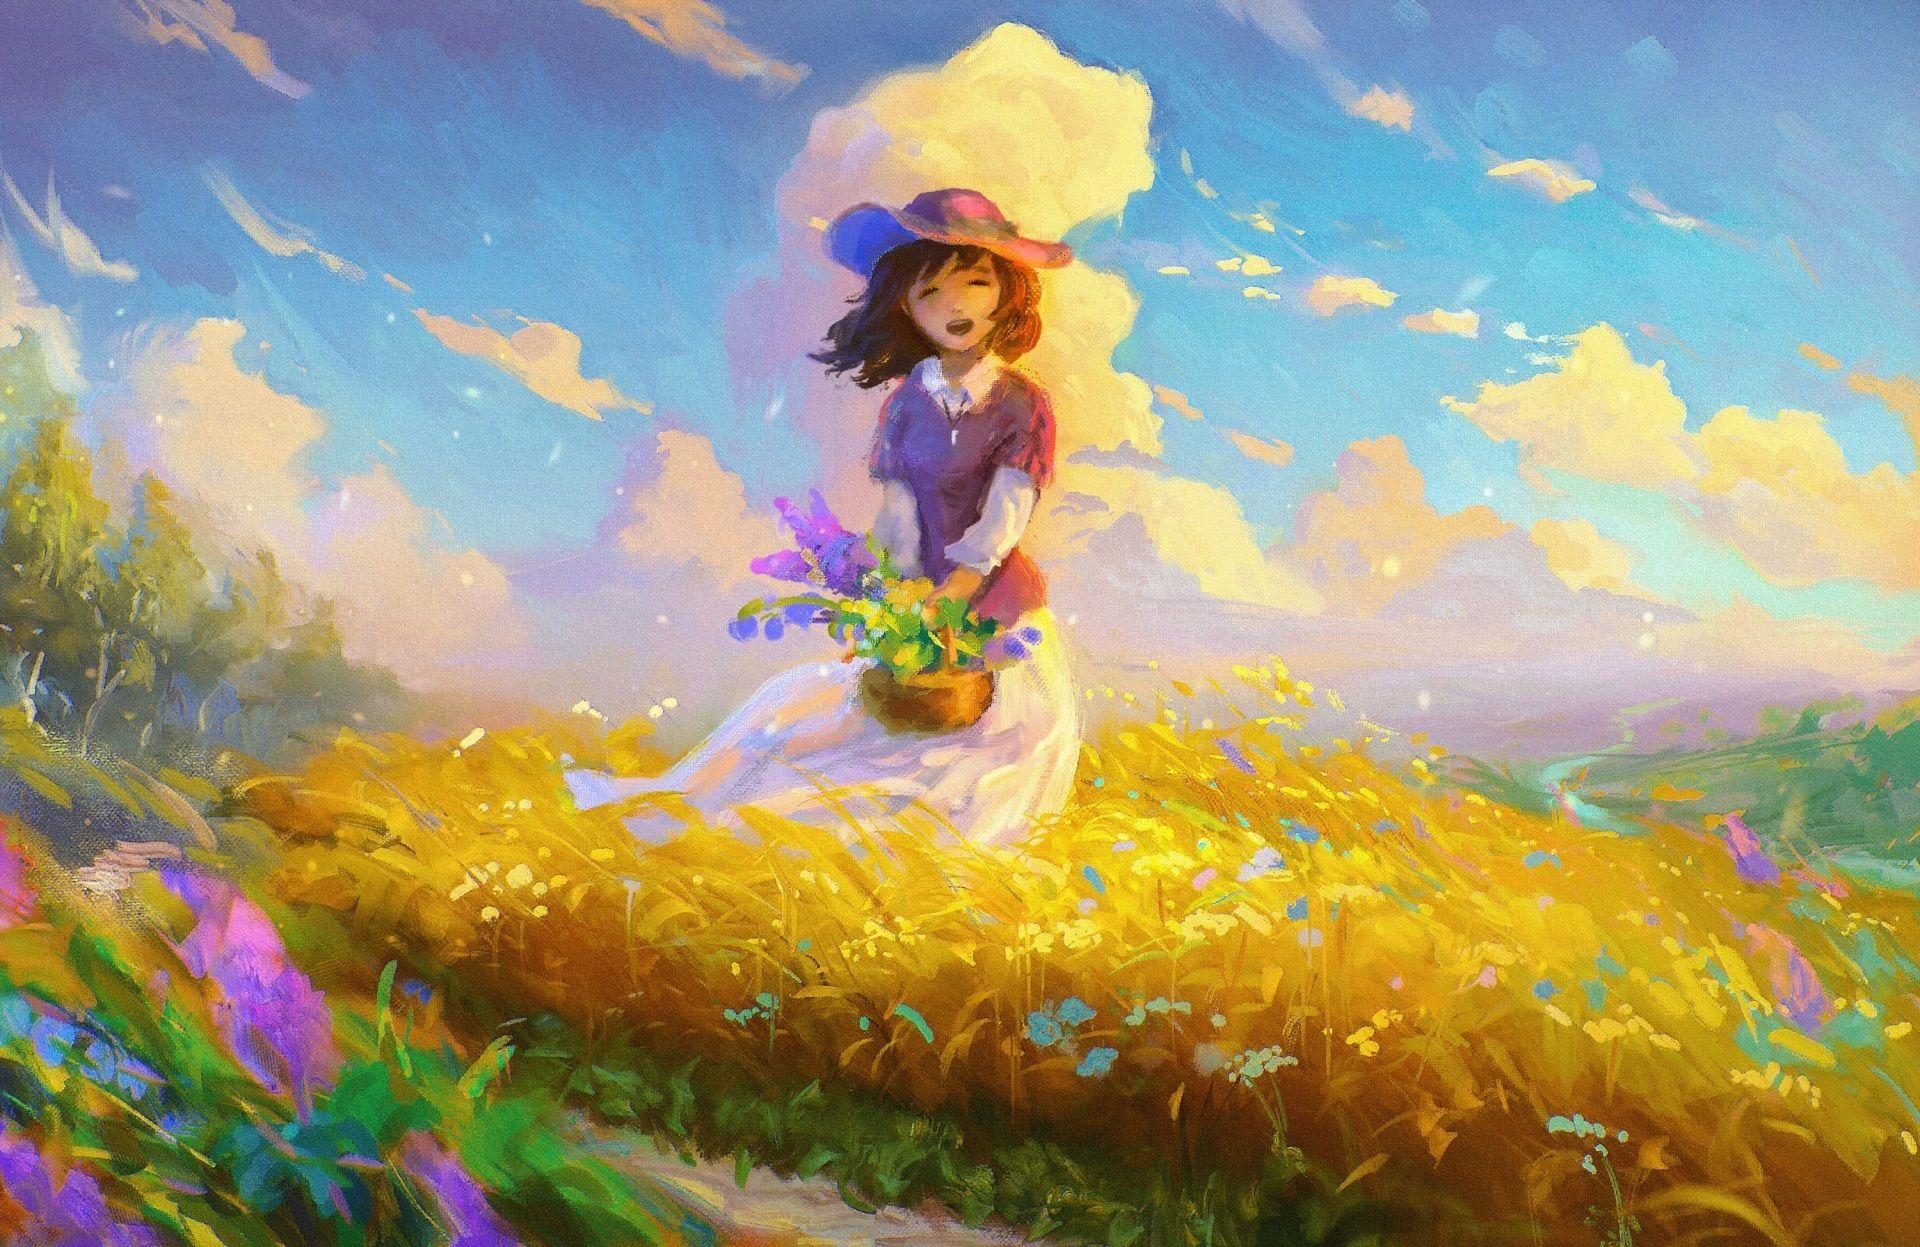 1920x1247 cute girl hq desktop wallpaper free download